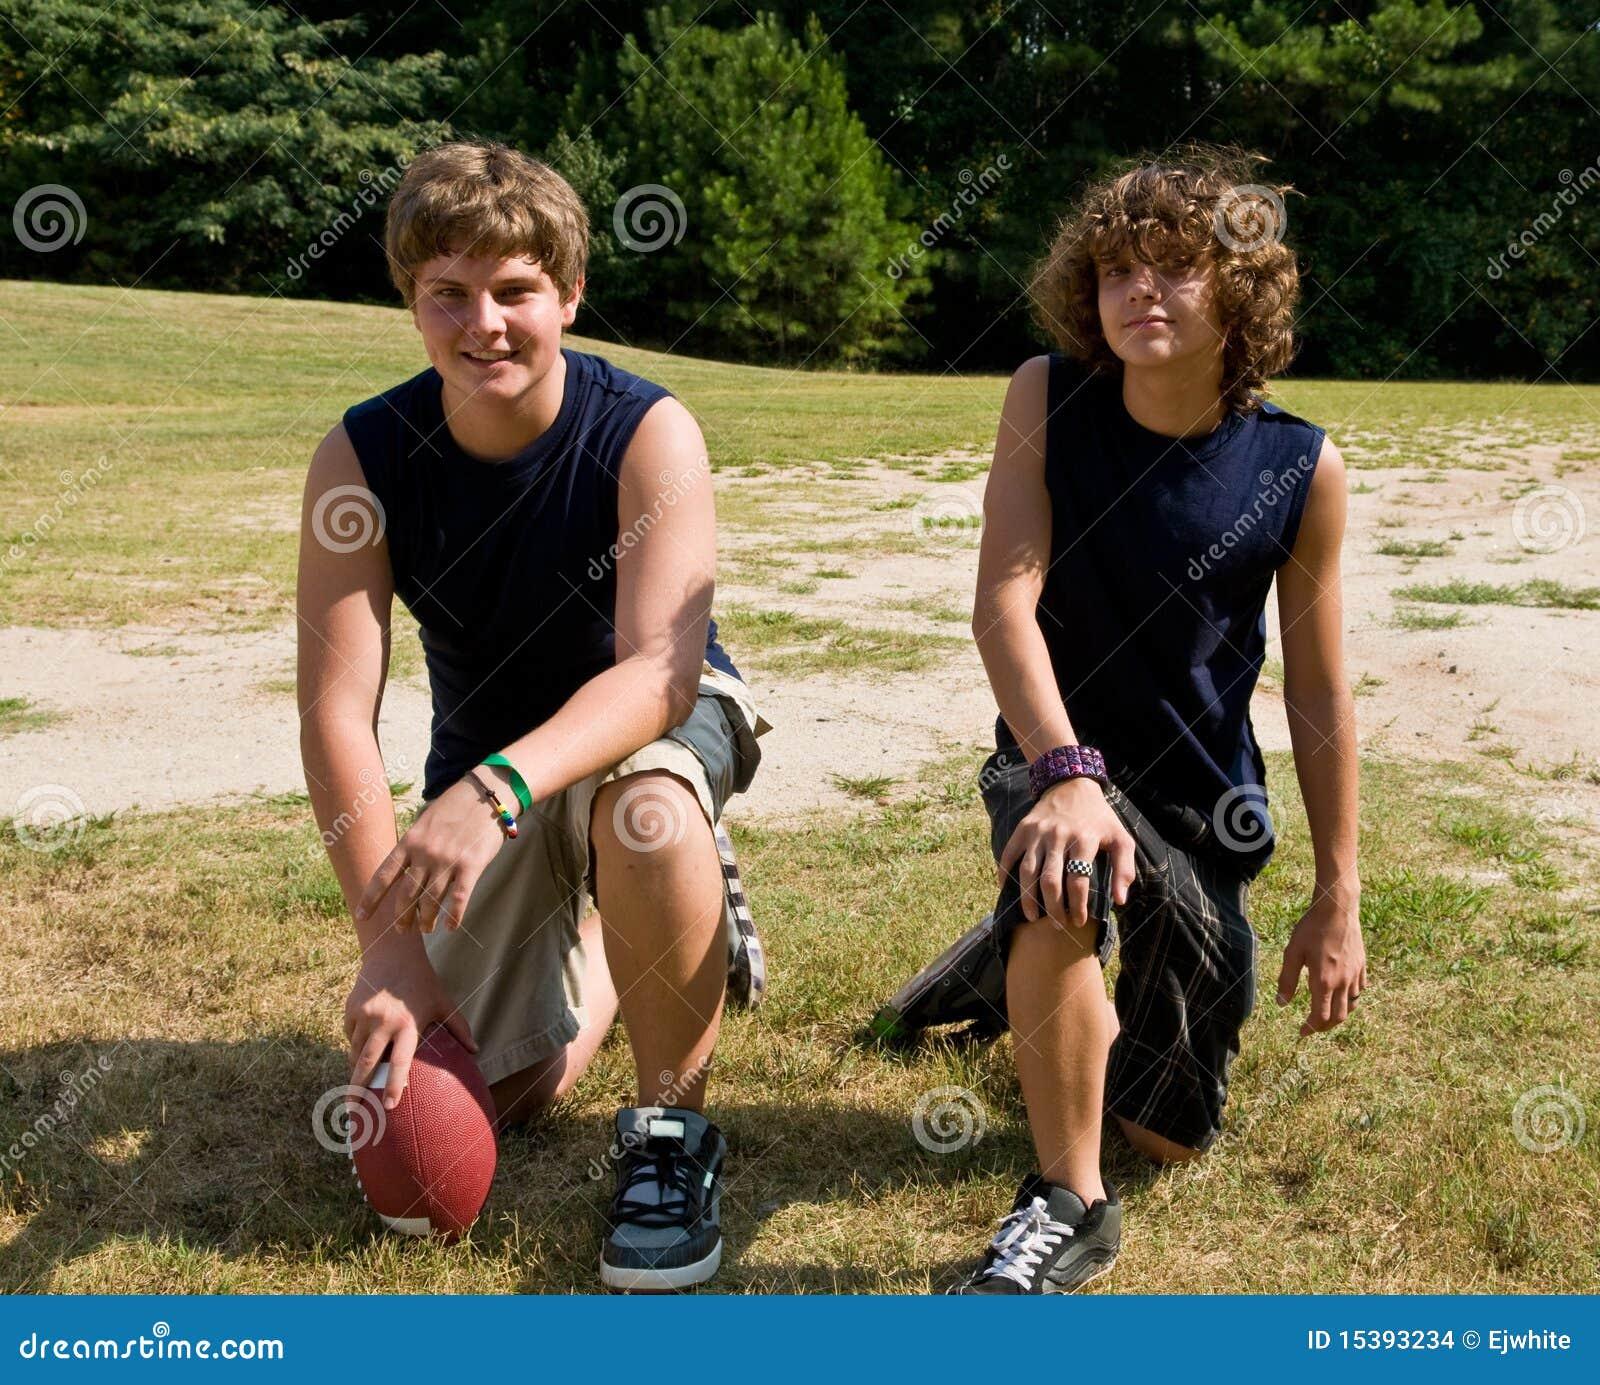 Jeunes athlètes du football